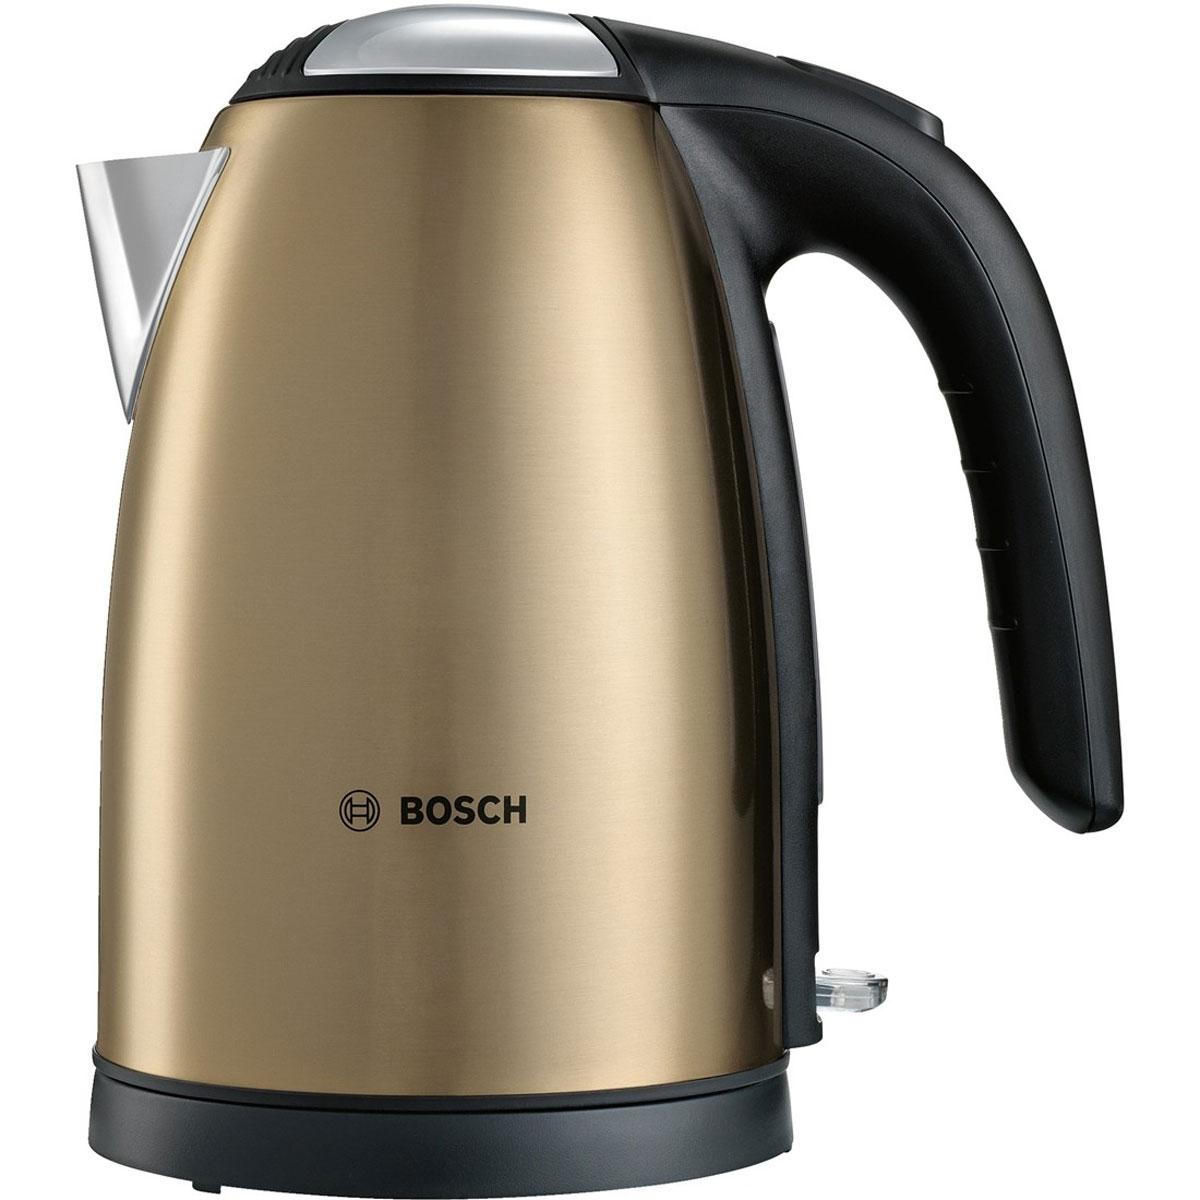 Bosch TWK 7808, Gold чайник чайник bosch twk 6001